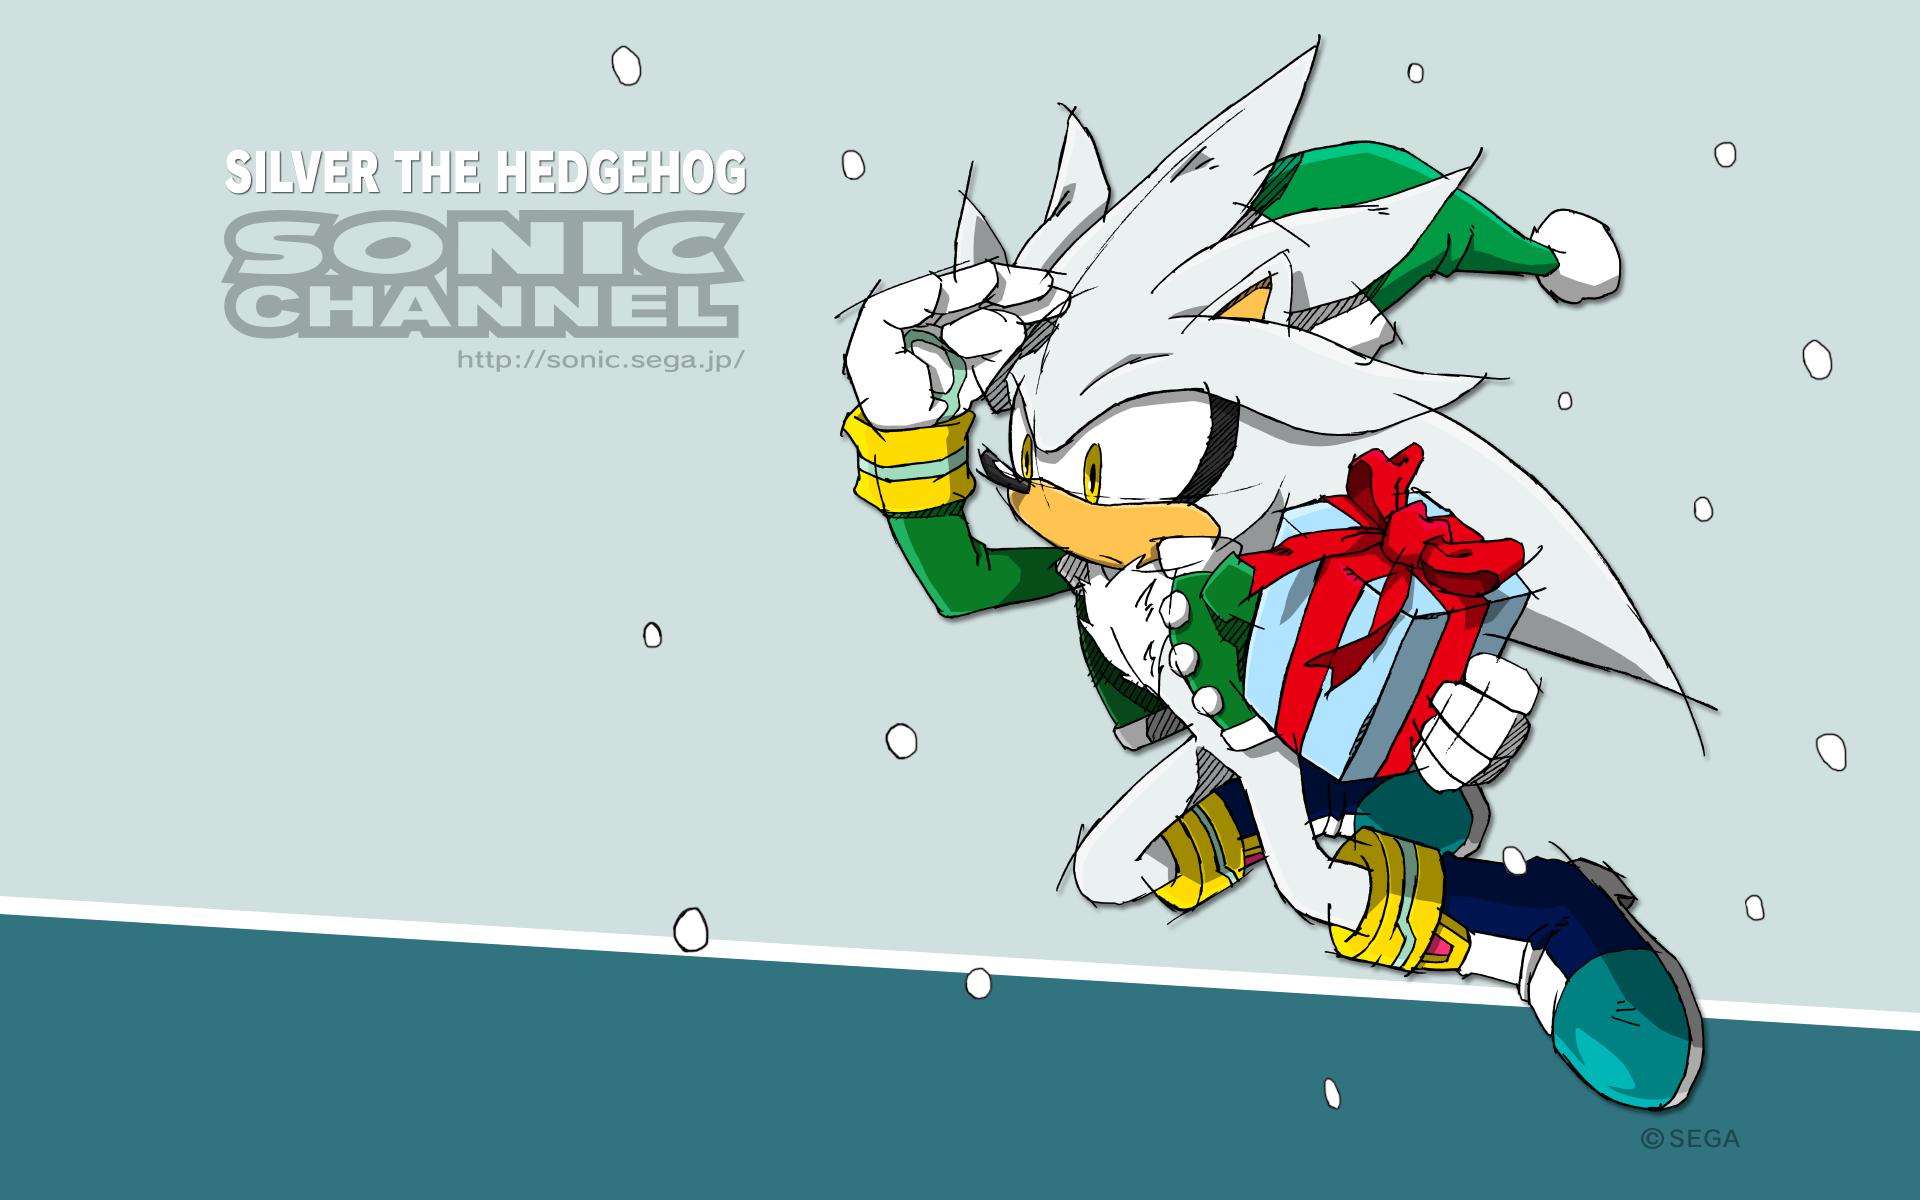 Silver The Hedgehog (December 2015)